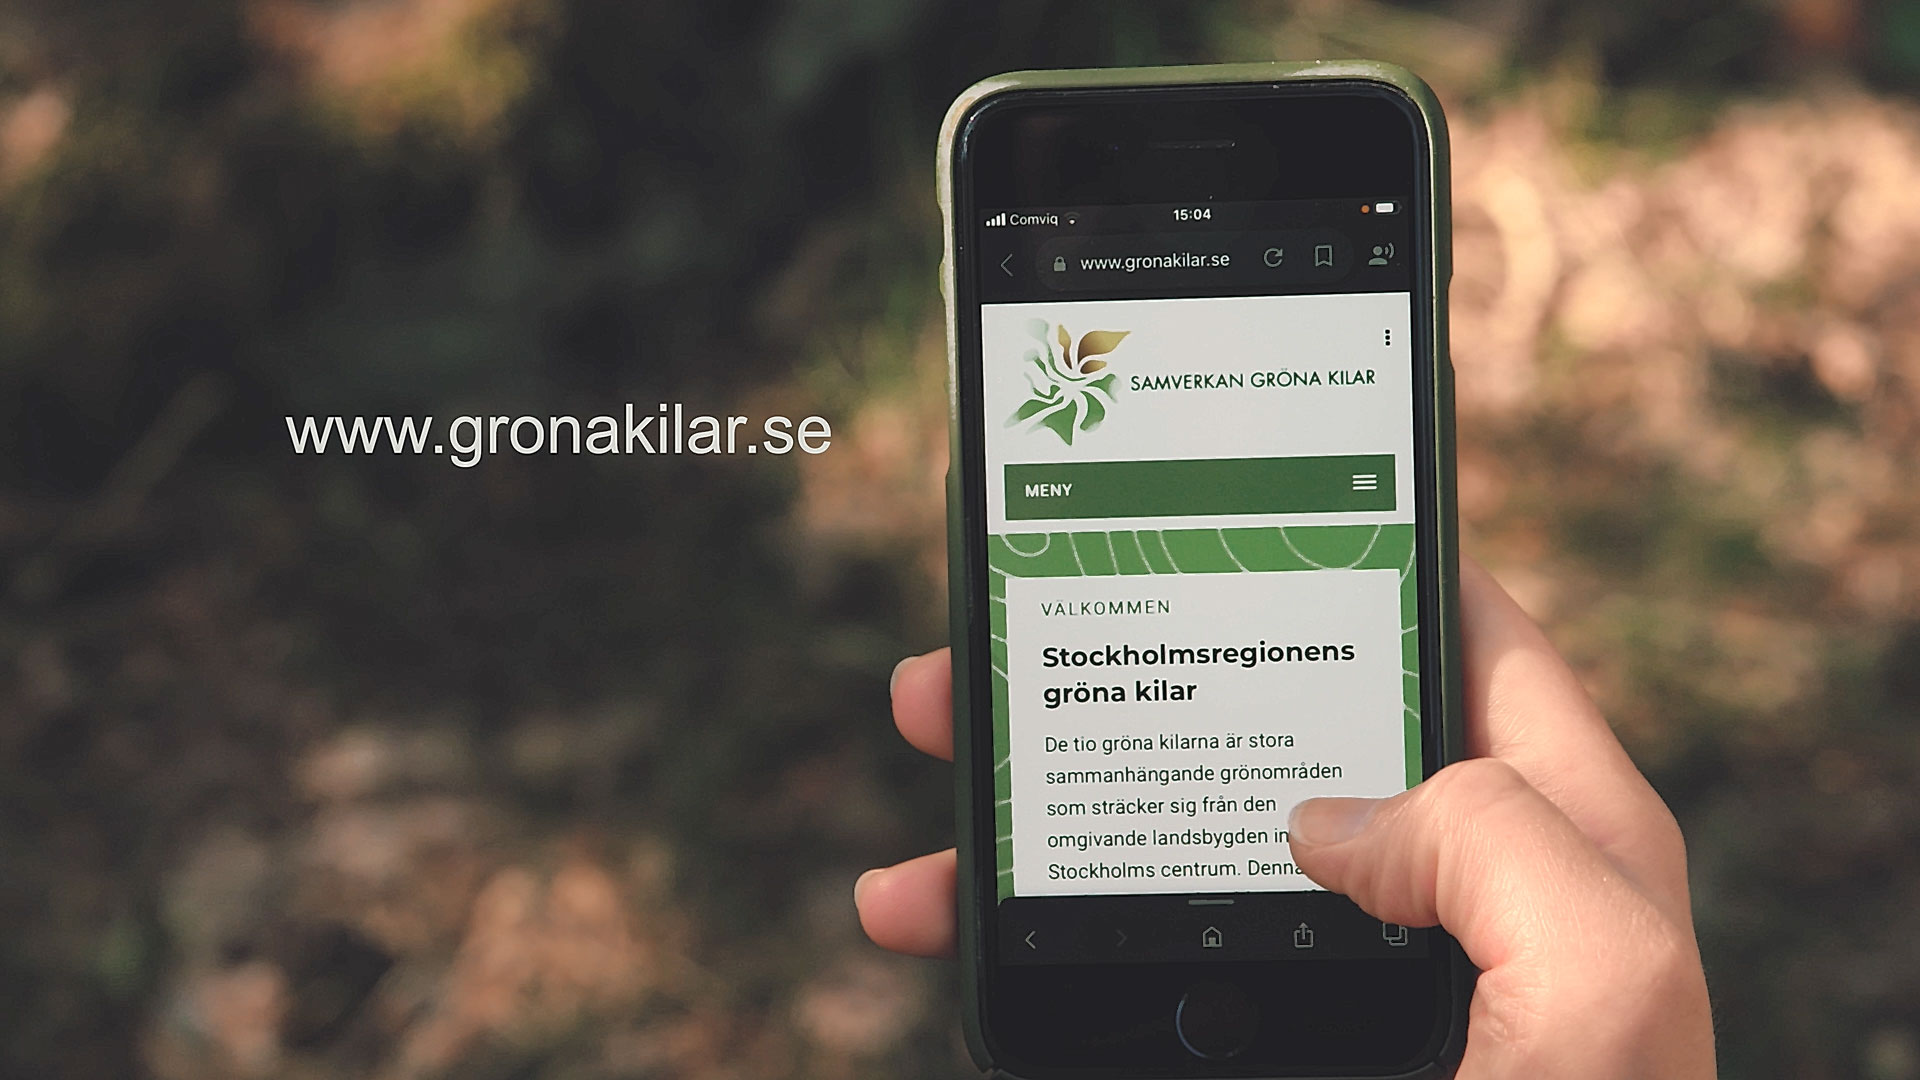 https://www.gronakilar.se/pics/contentPics/mediaplayer-thumbnails-2/1.jpg